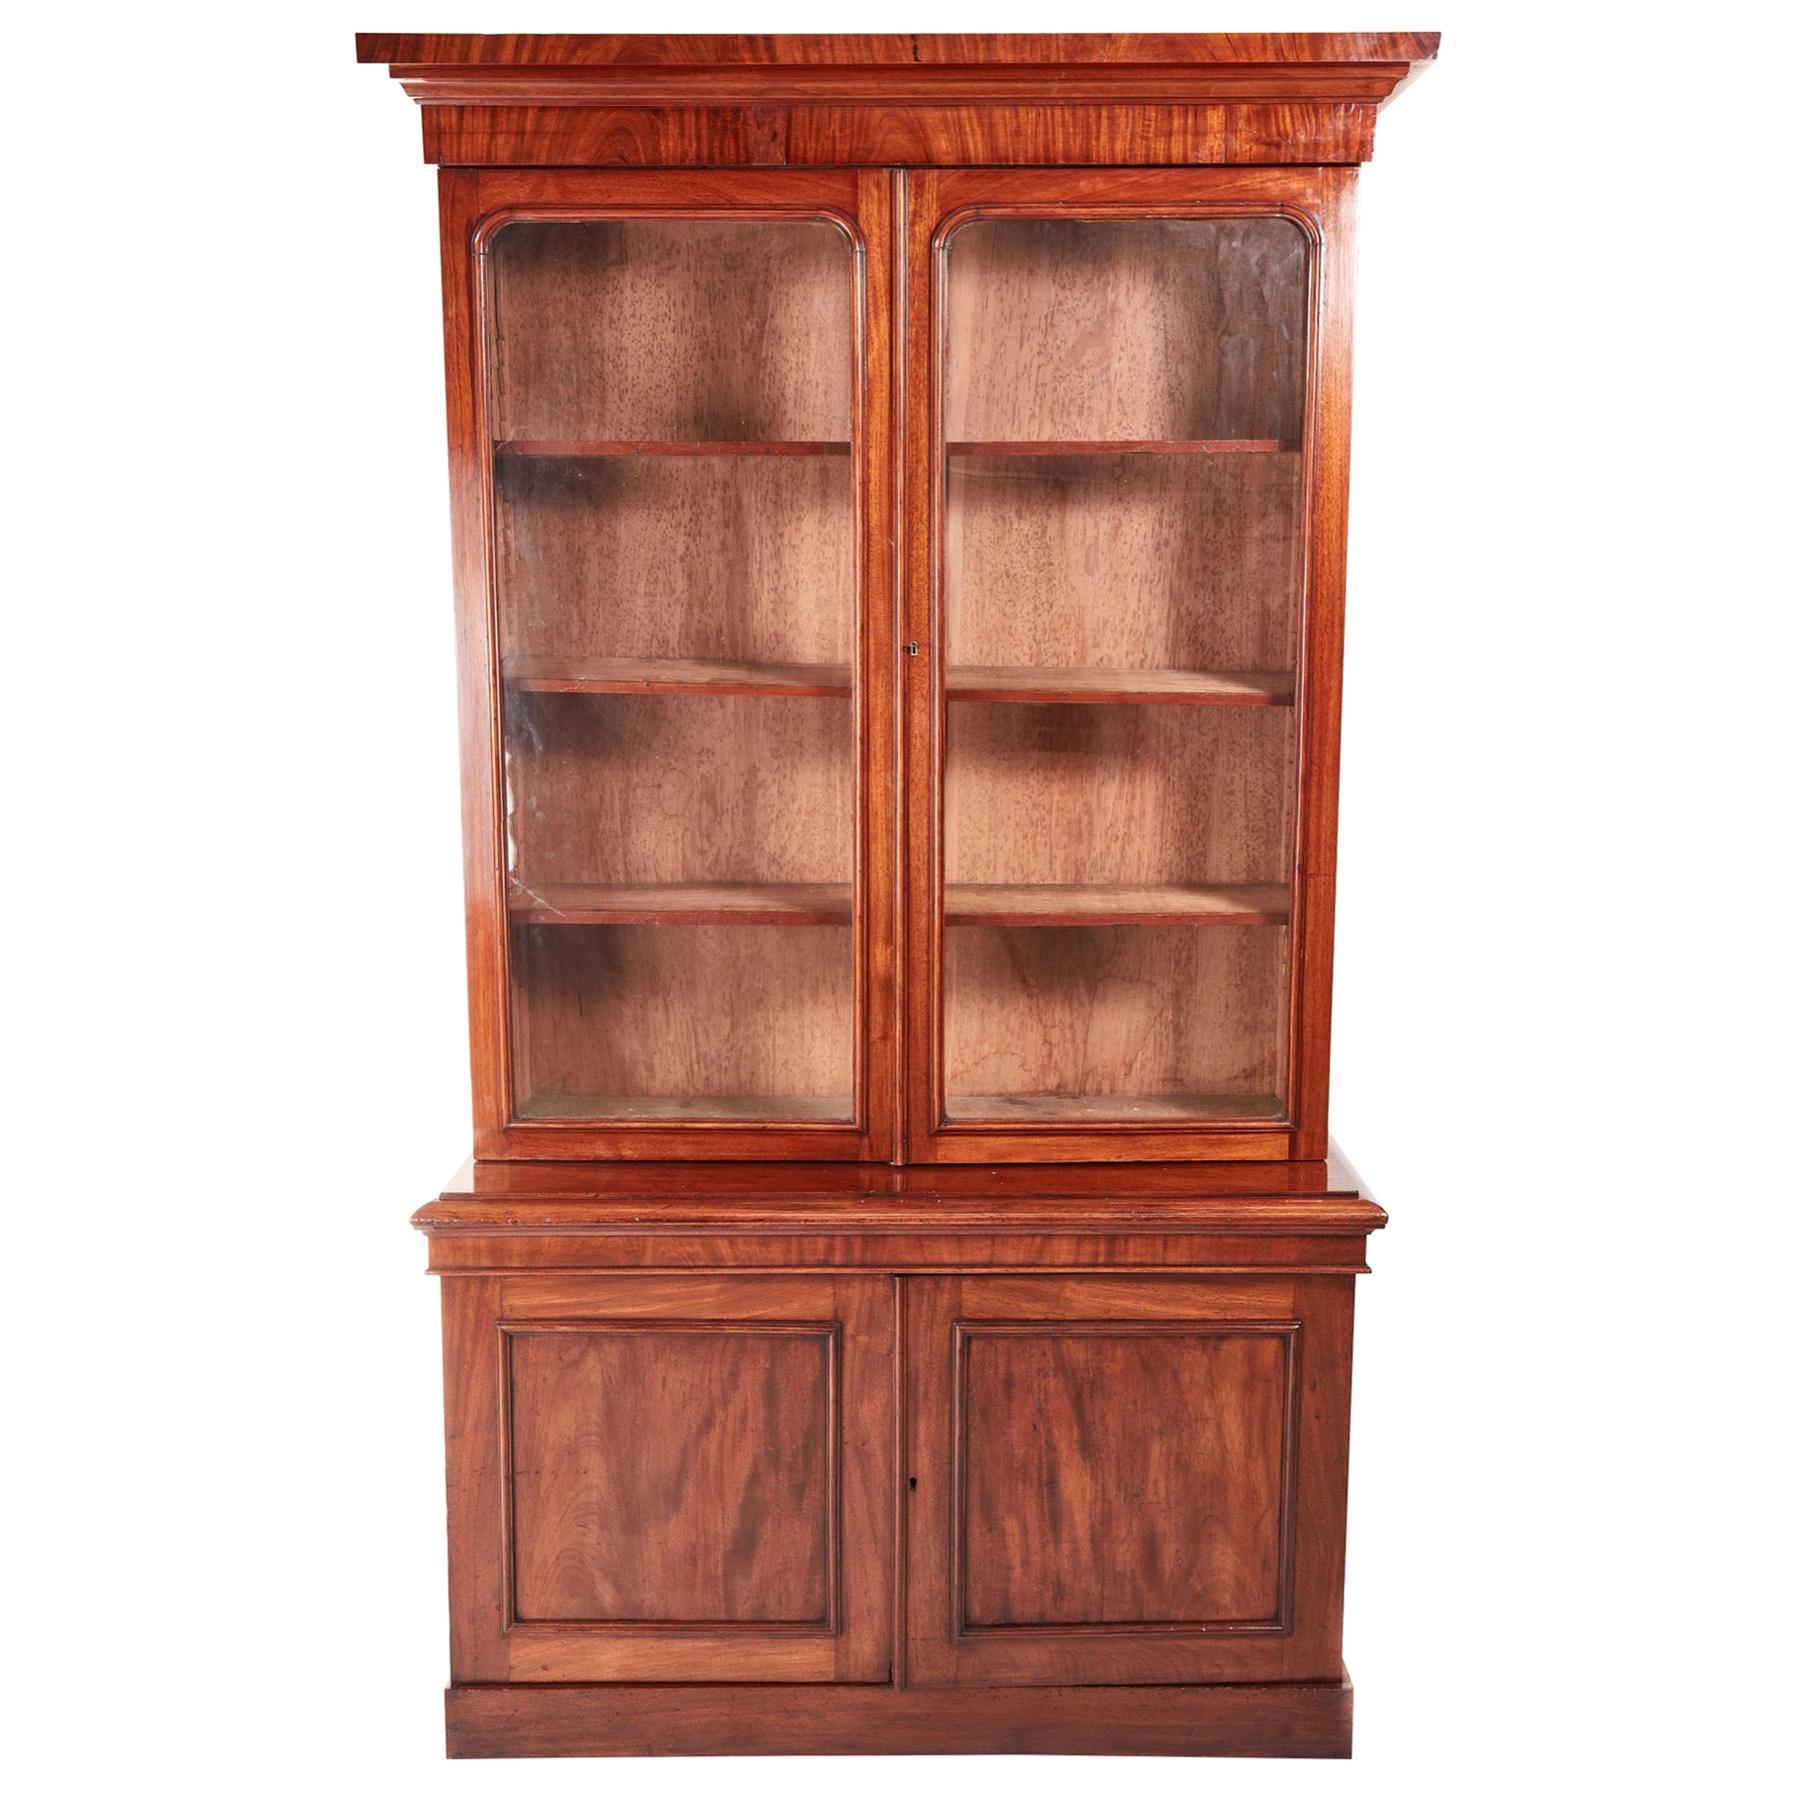 Quality Antique Victorian Mahogany Bookcase